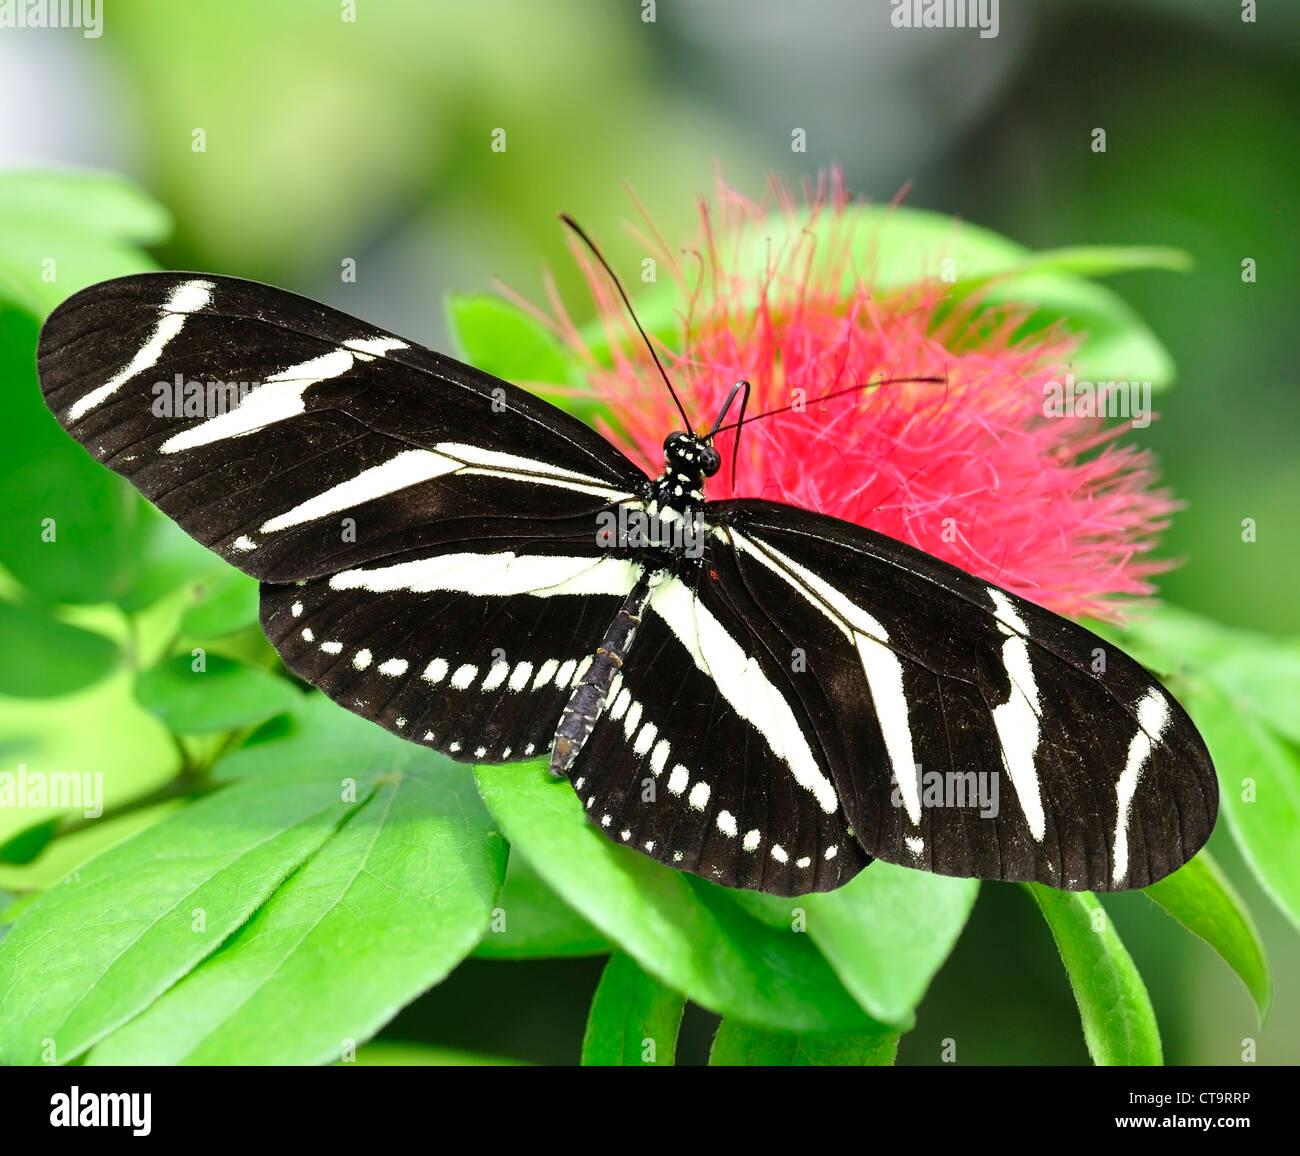 Zebra Longwing (Heliconius Charitonius) FARFALLA Immagini Stock